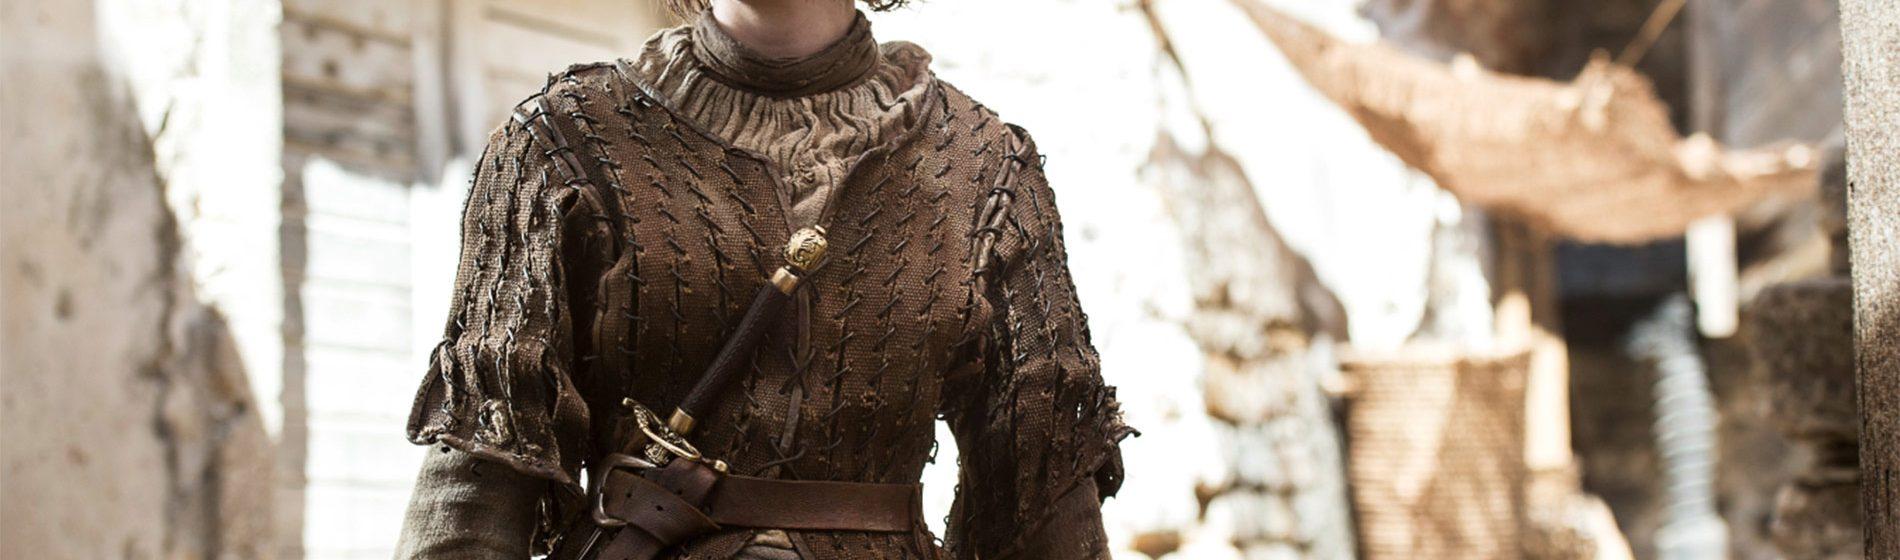 Game of Thrones - Season 5 Episode 2